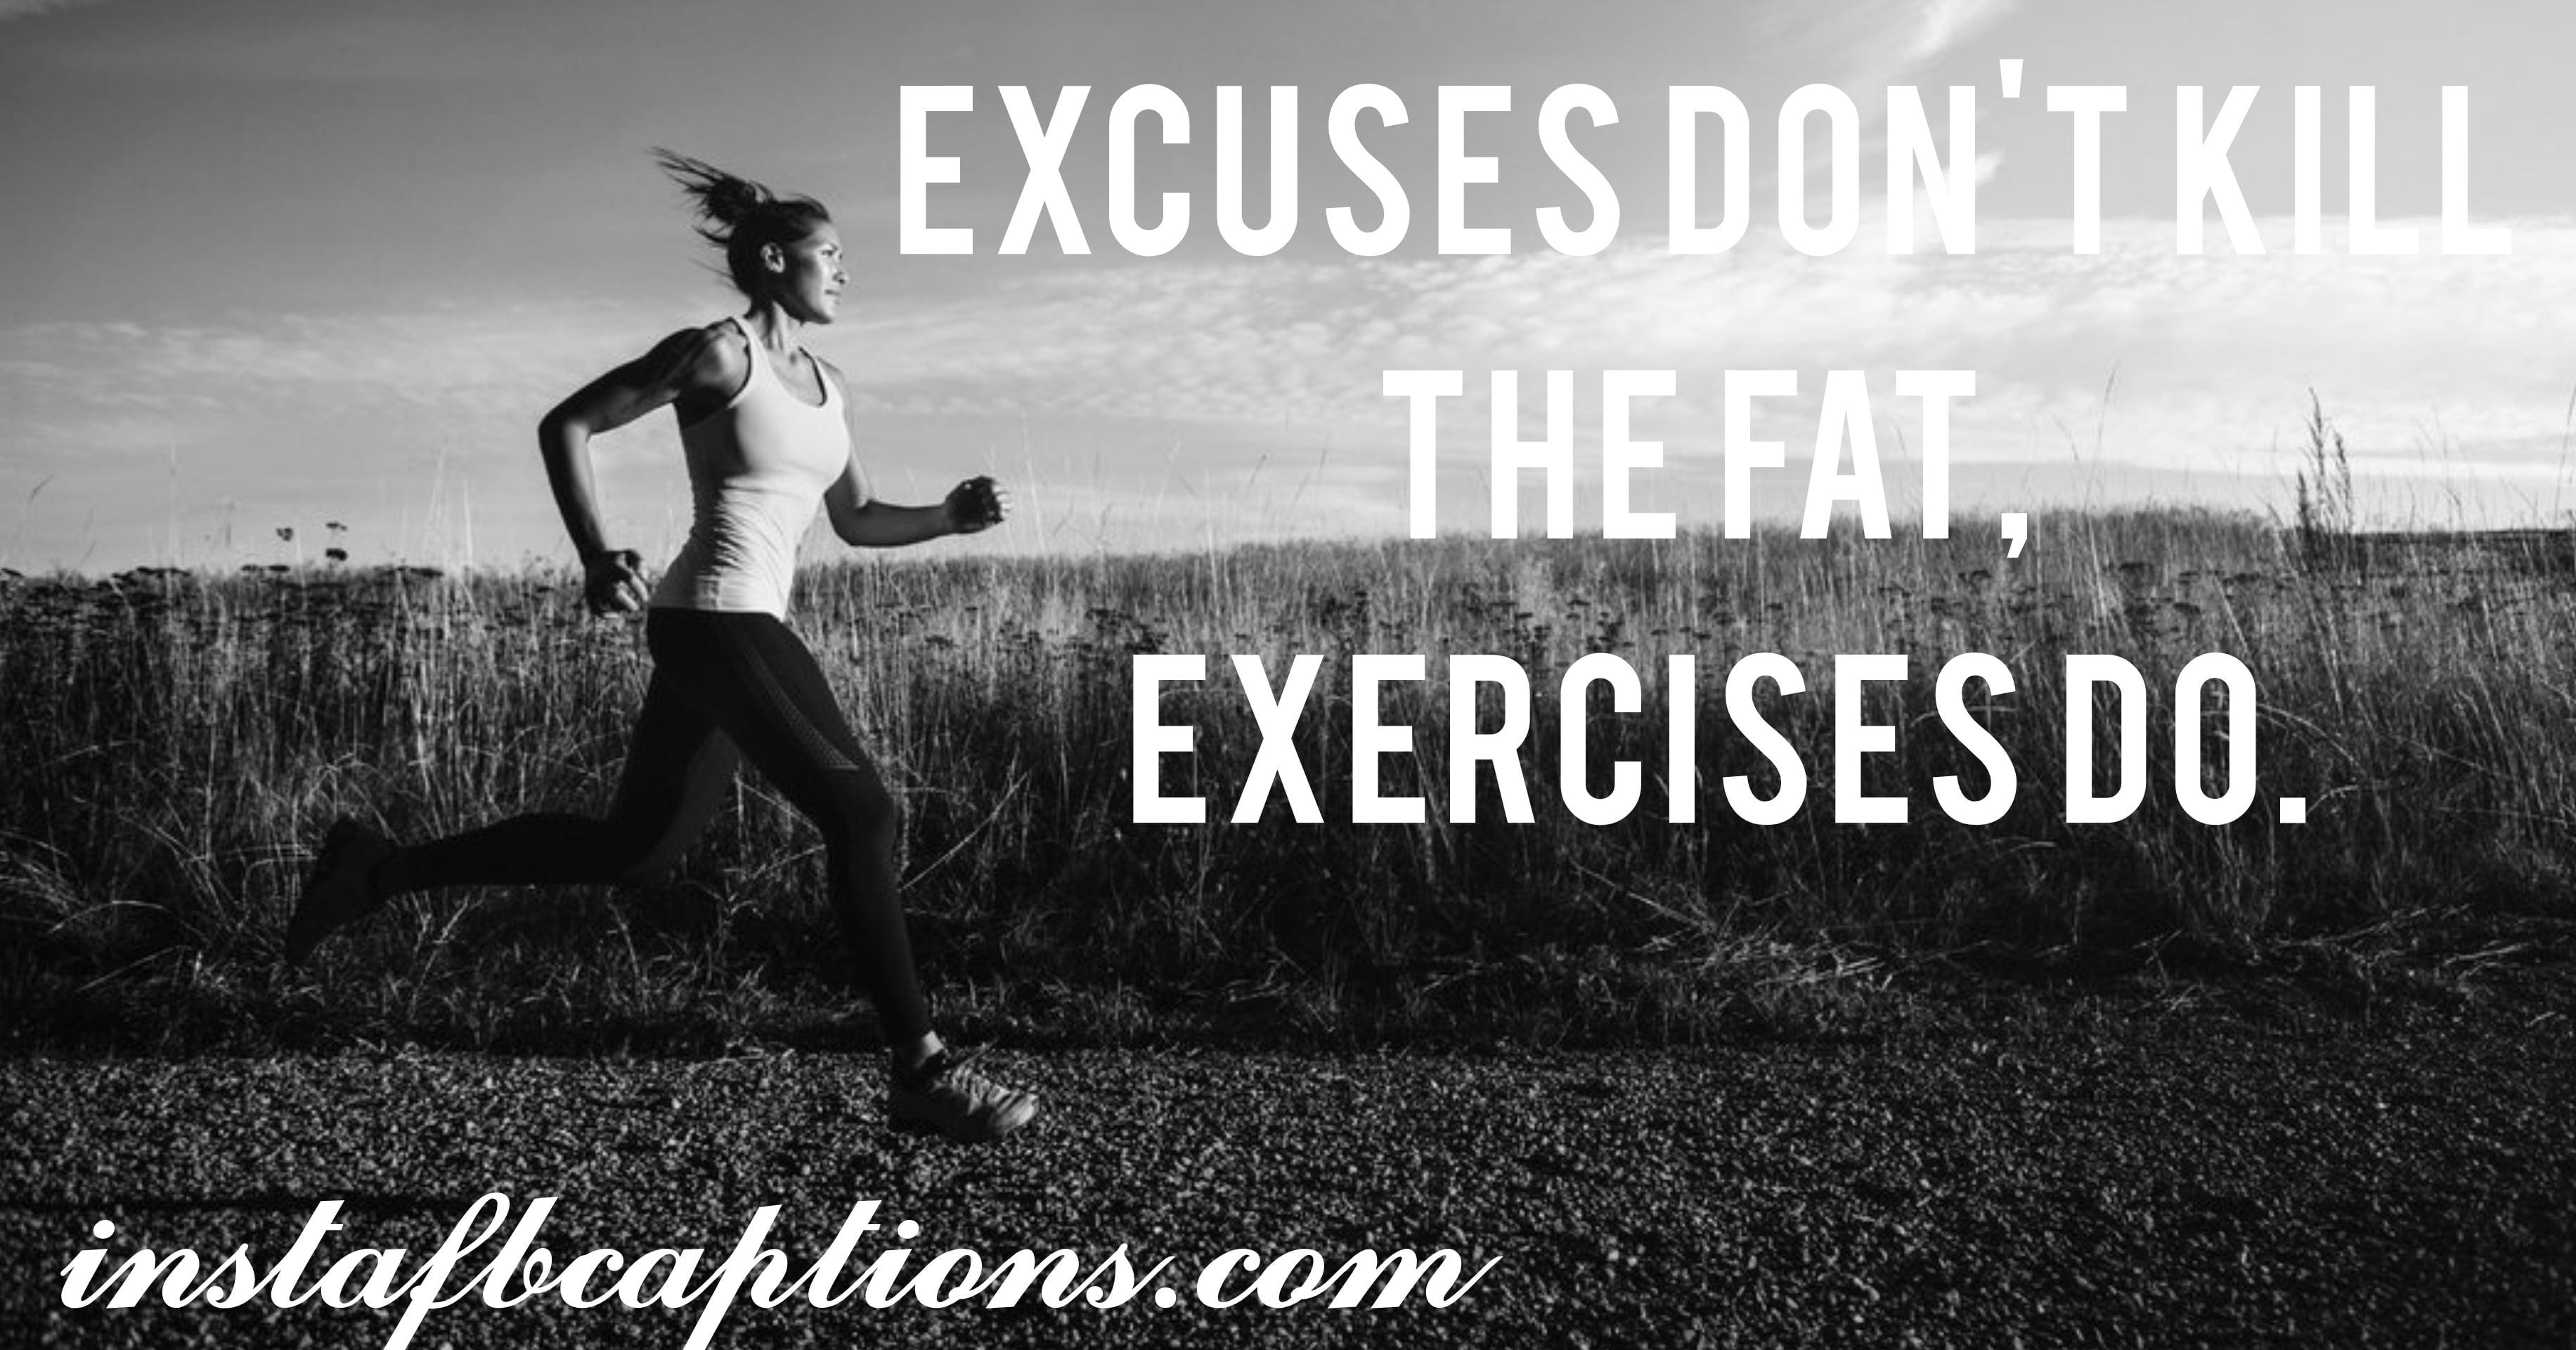 Exercise Captions  - Exercise Captions - 110+ GYM & WORKOUT Instagram Captions 2021